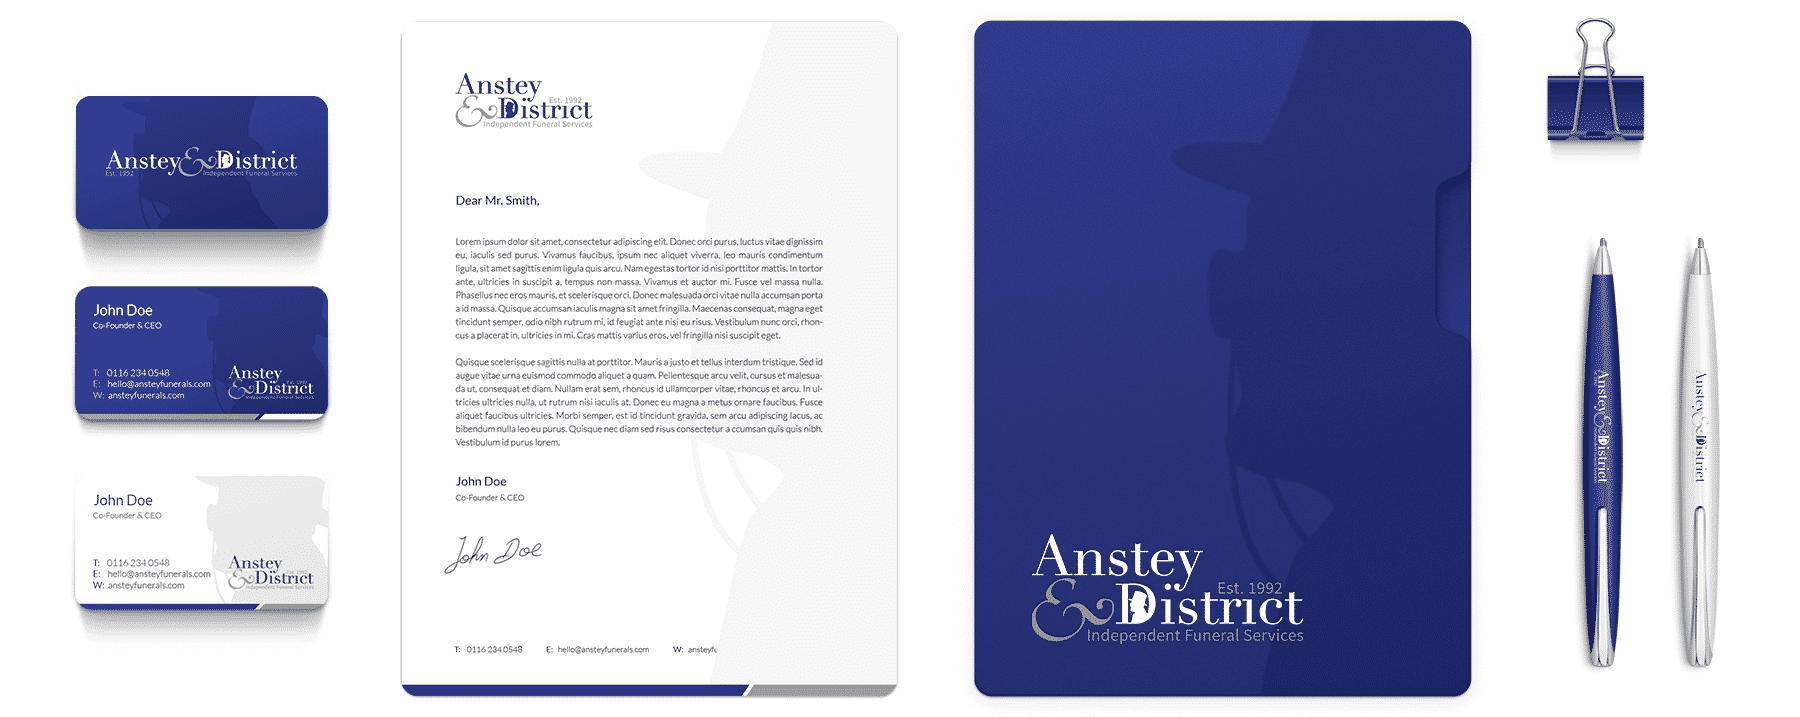 Anstey & District Funeral Services Brand Design